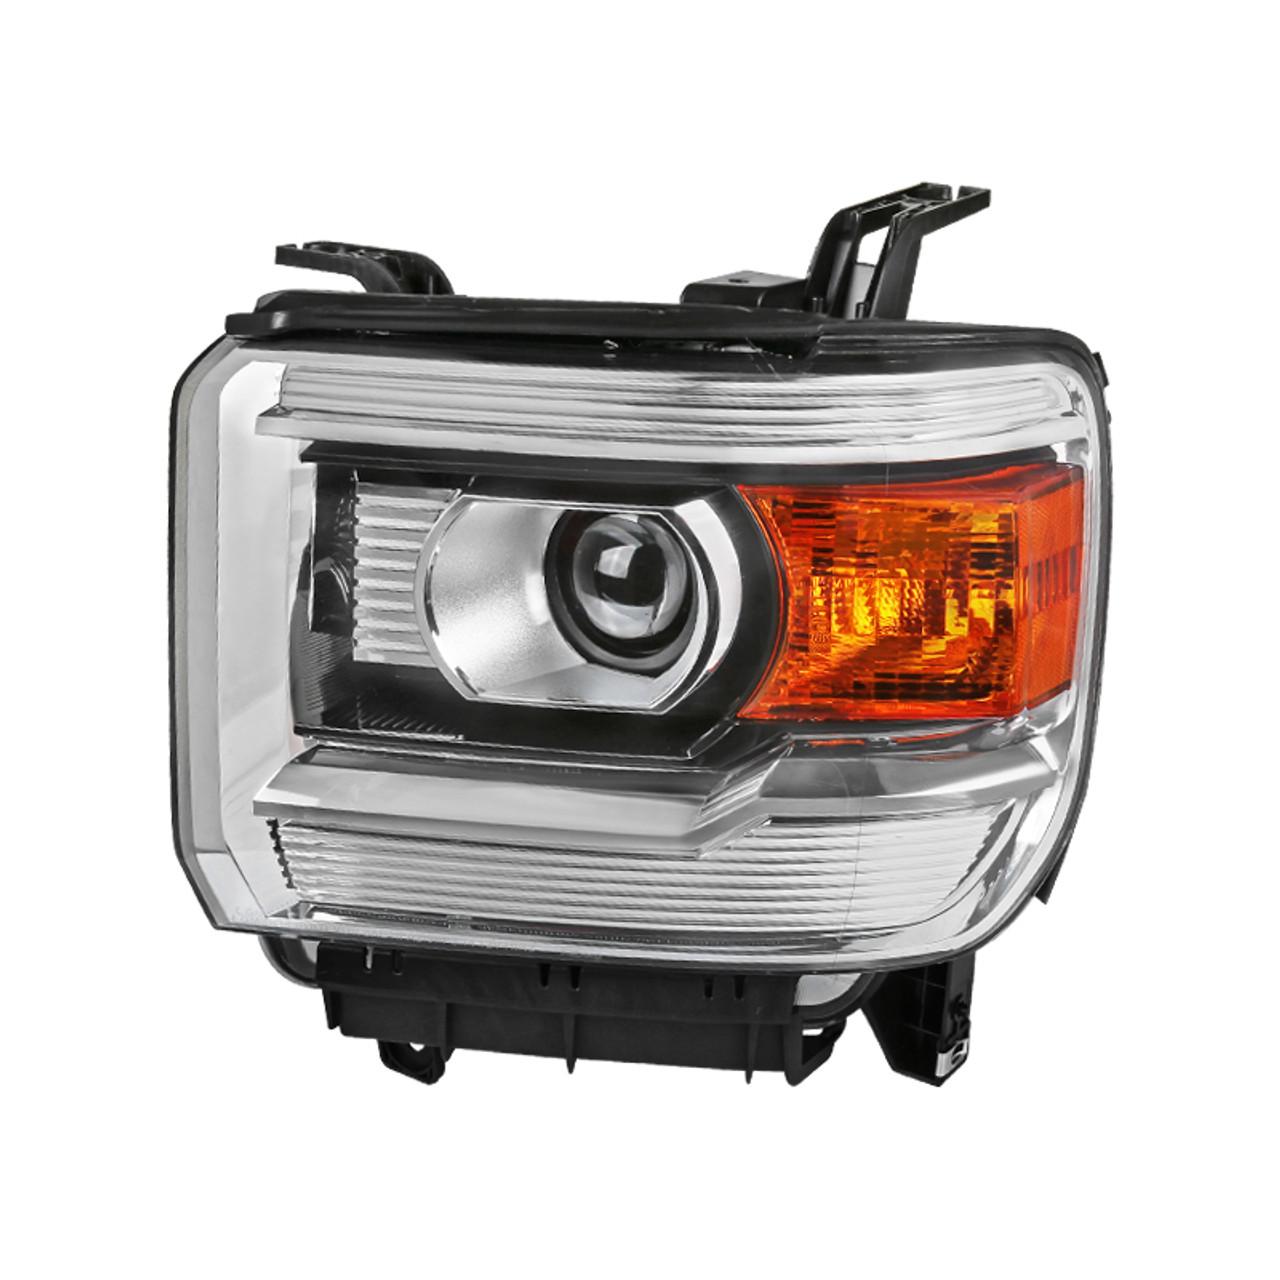 Larson Electronics 0321OXAJYRG 2014 Gmc SIERRA-LH Post mount spotlight 6 inch 100W Halogen -Black Driver side WITH install kit